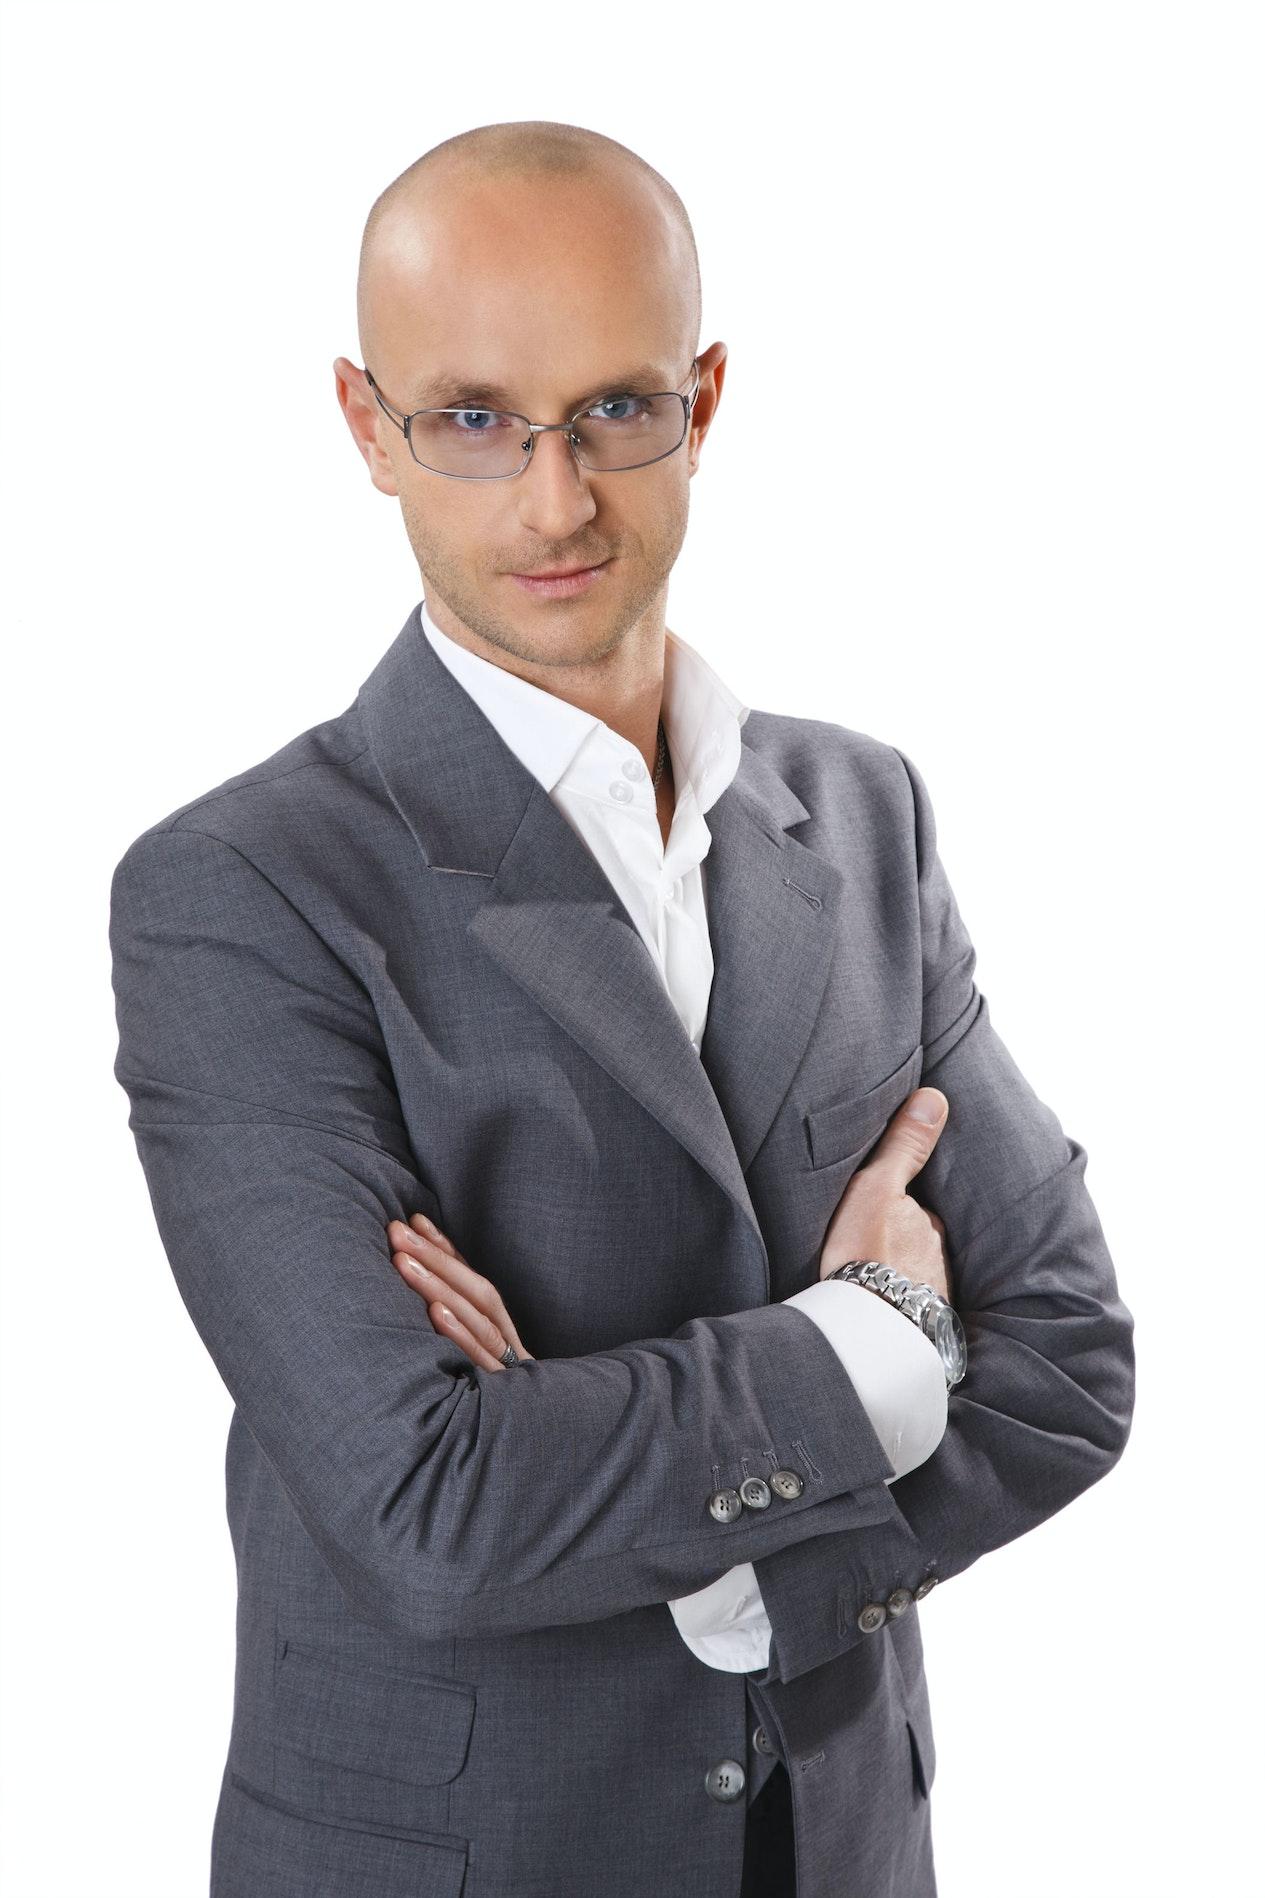 (c) PULS 4 / Jürgen Hammerschmid